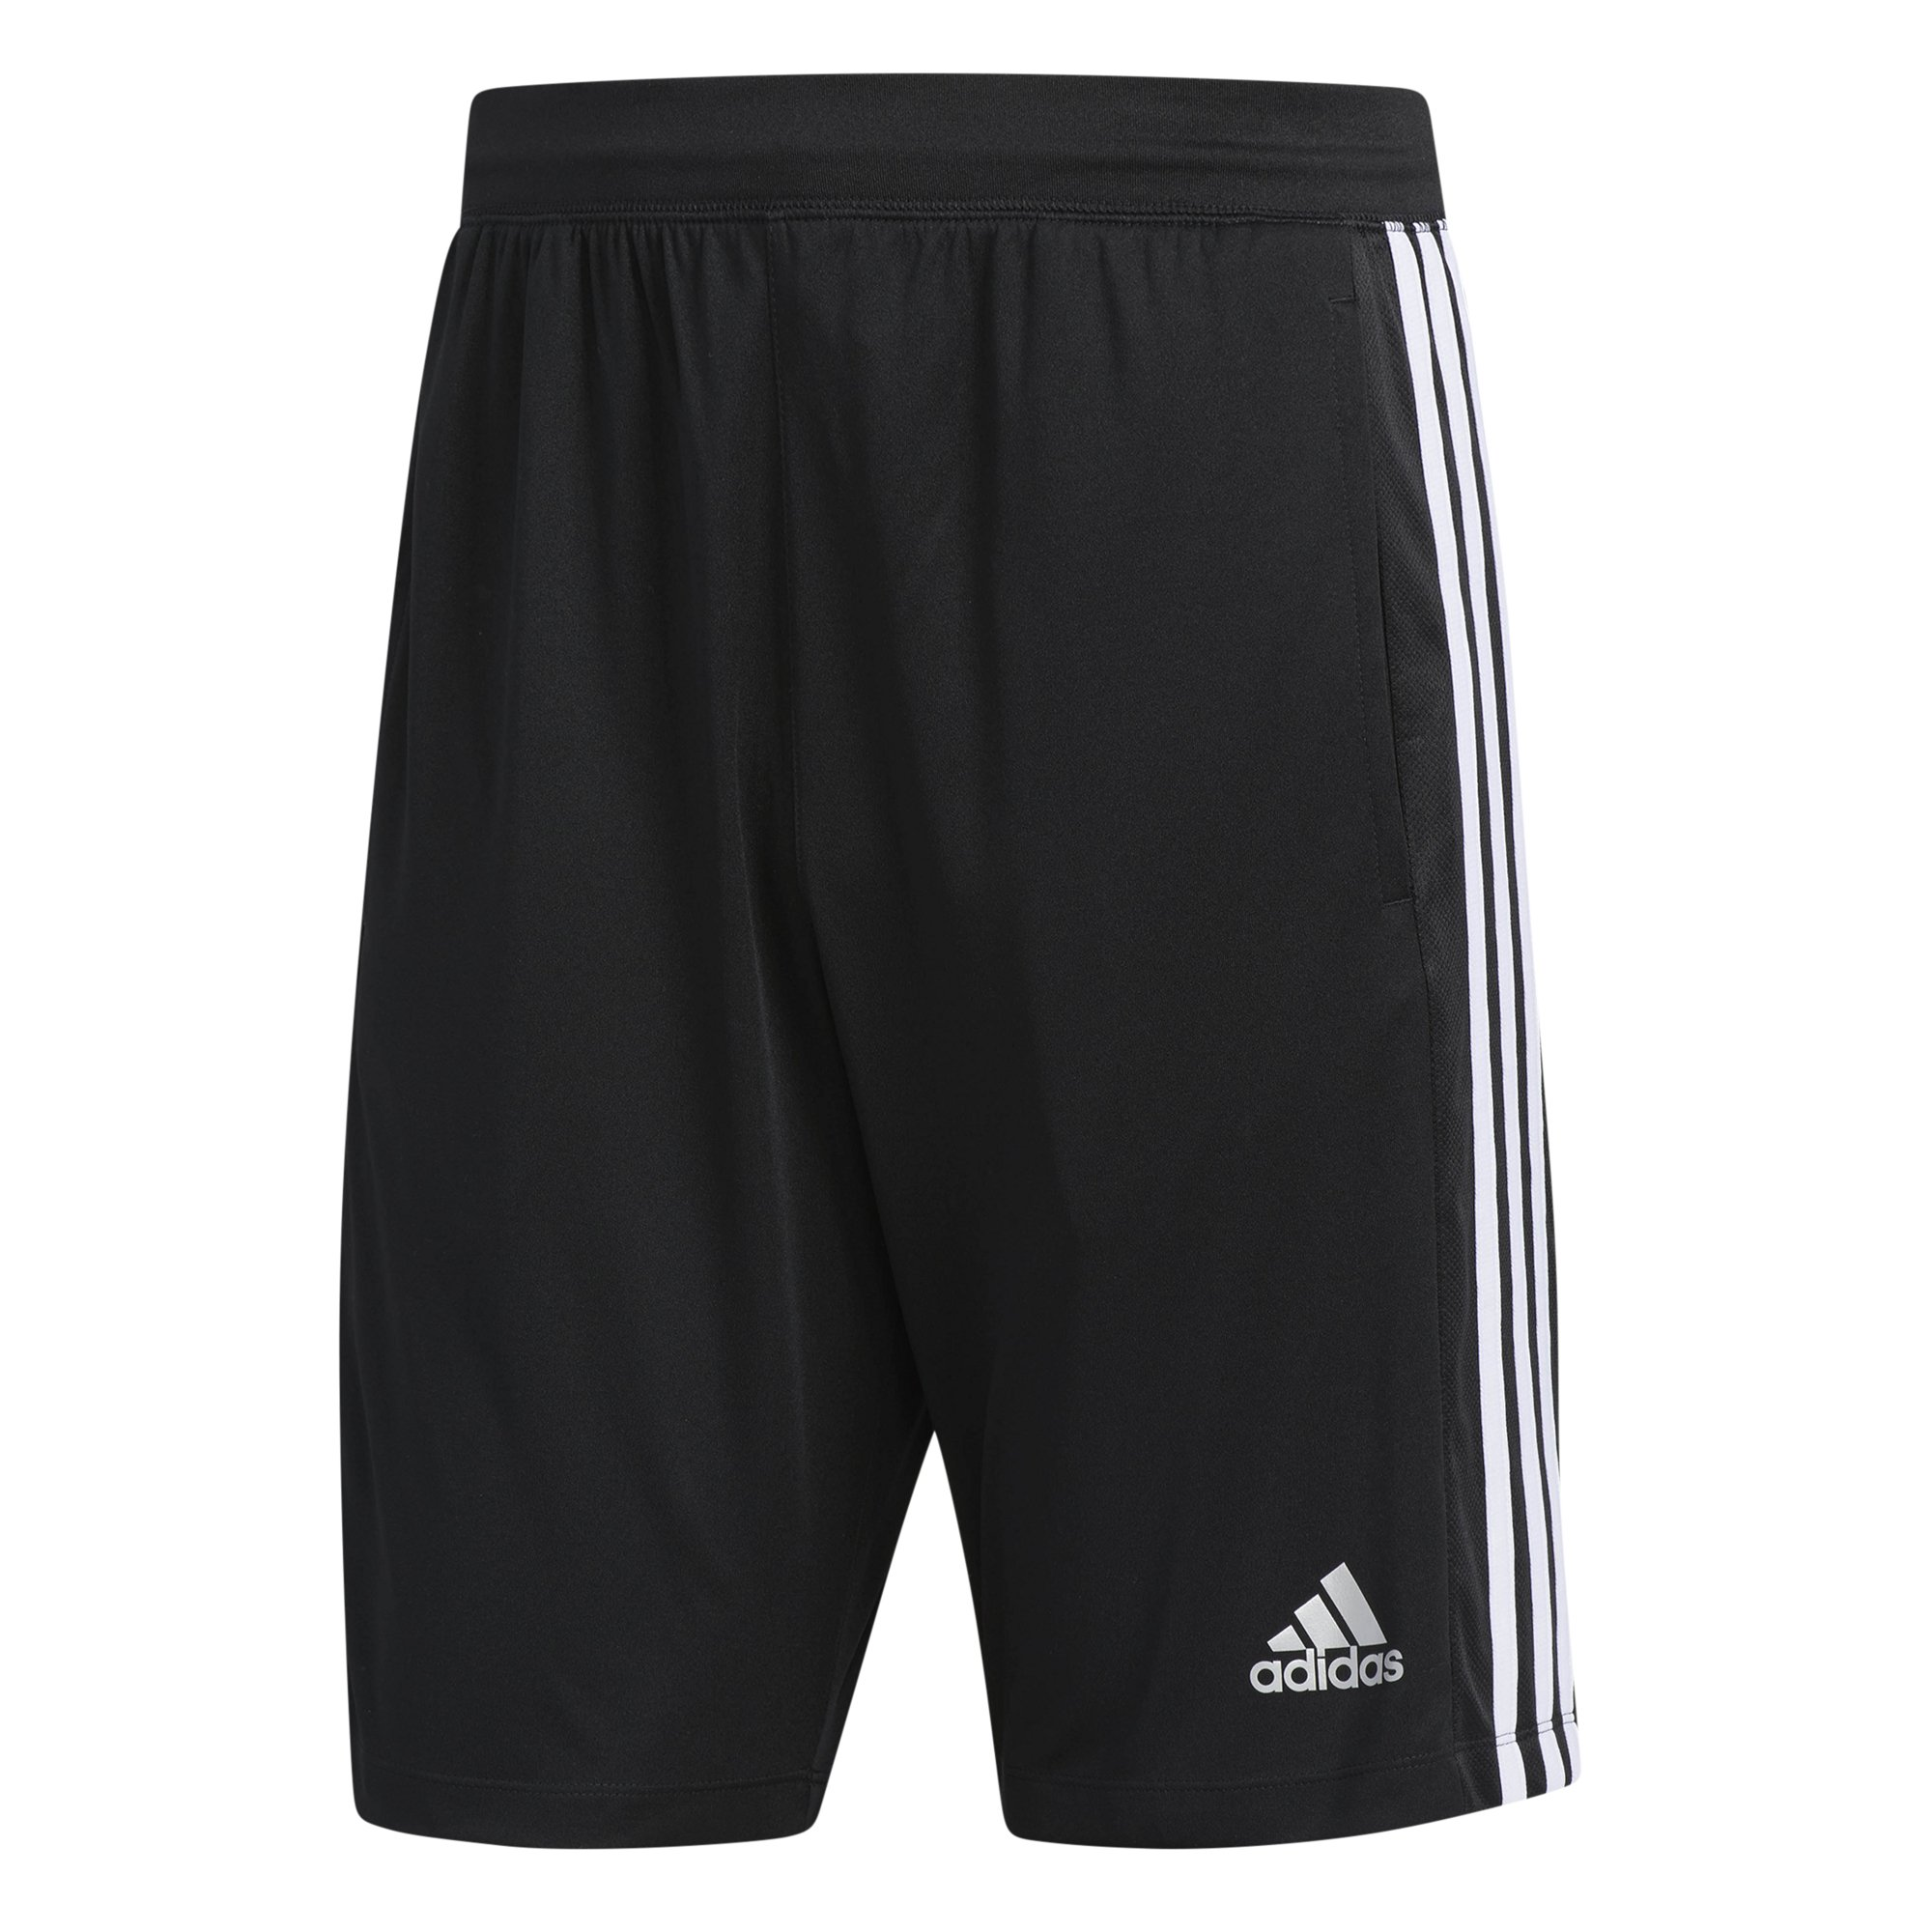 adidas Men's Designed-2-Move 3-Stripe Shorts, Black/White, Large